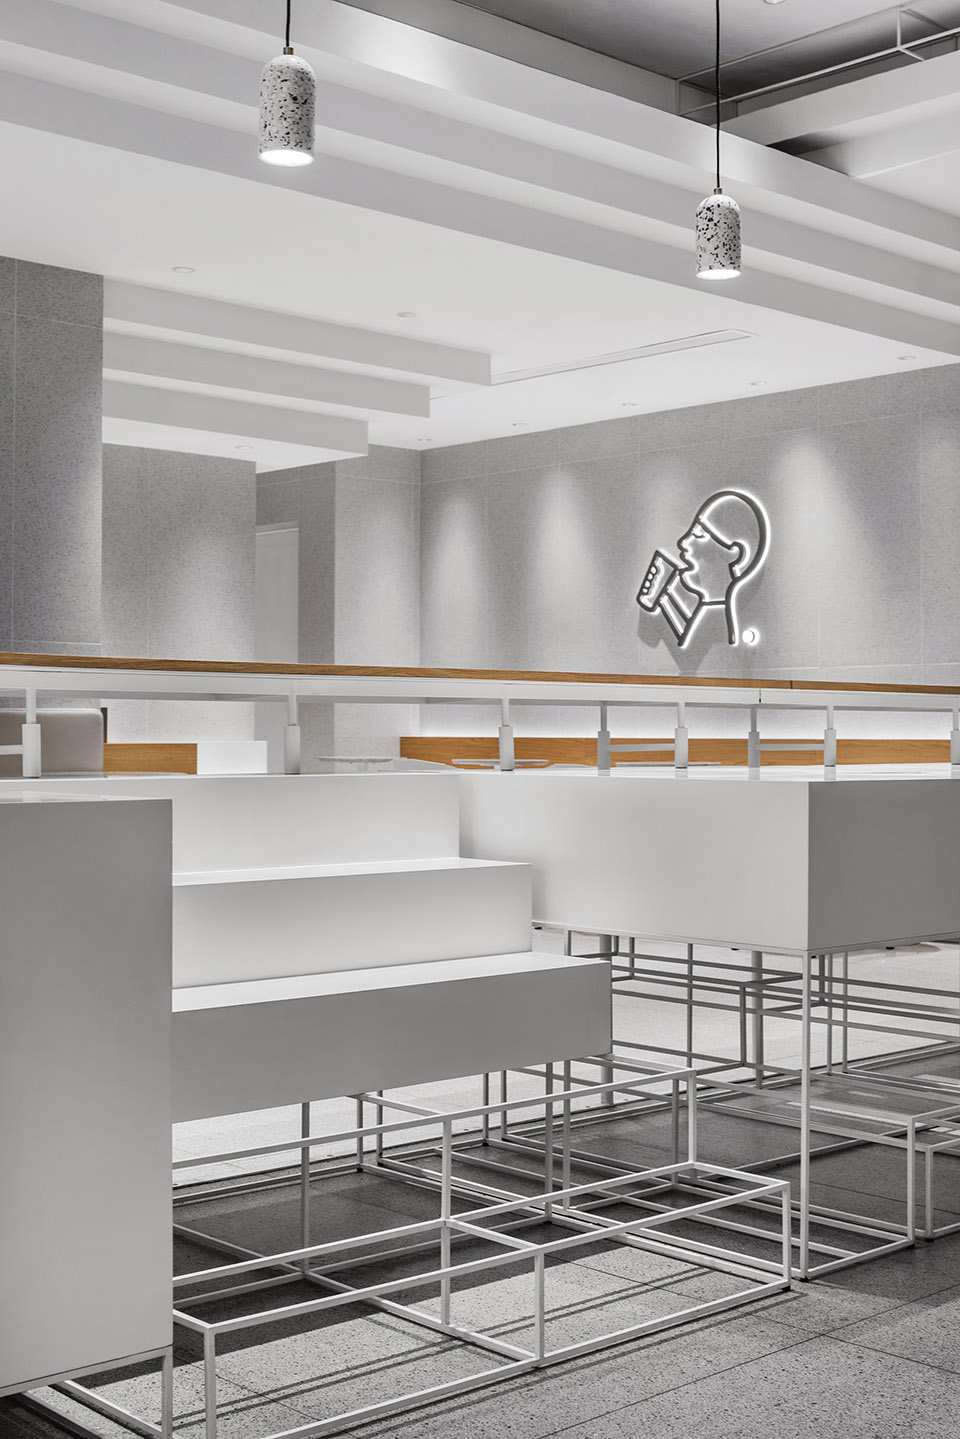 012-heytea-at-one-avenue-shenzhen-china-by-moc-design-office.jpg